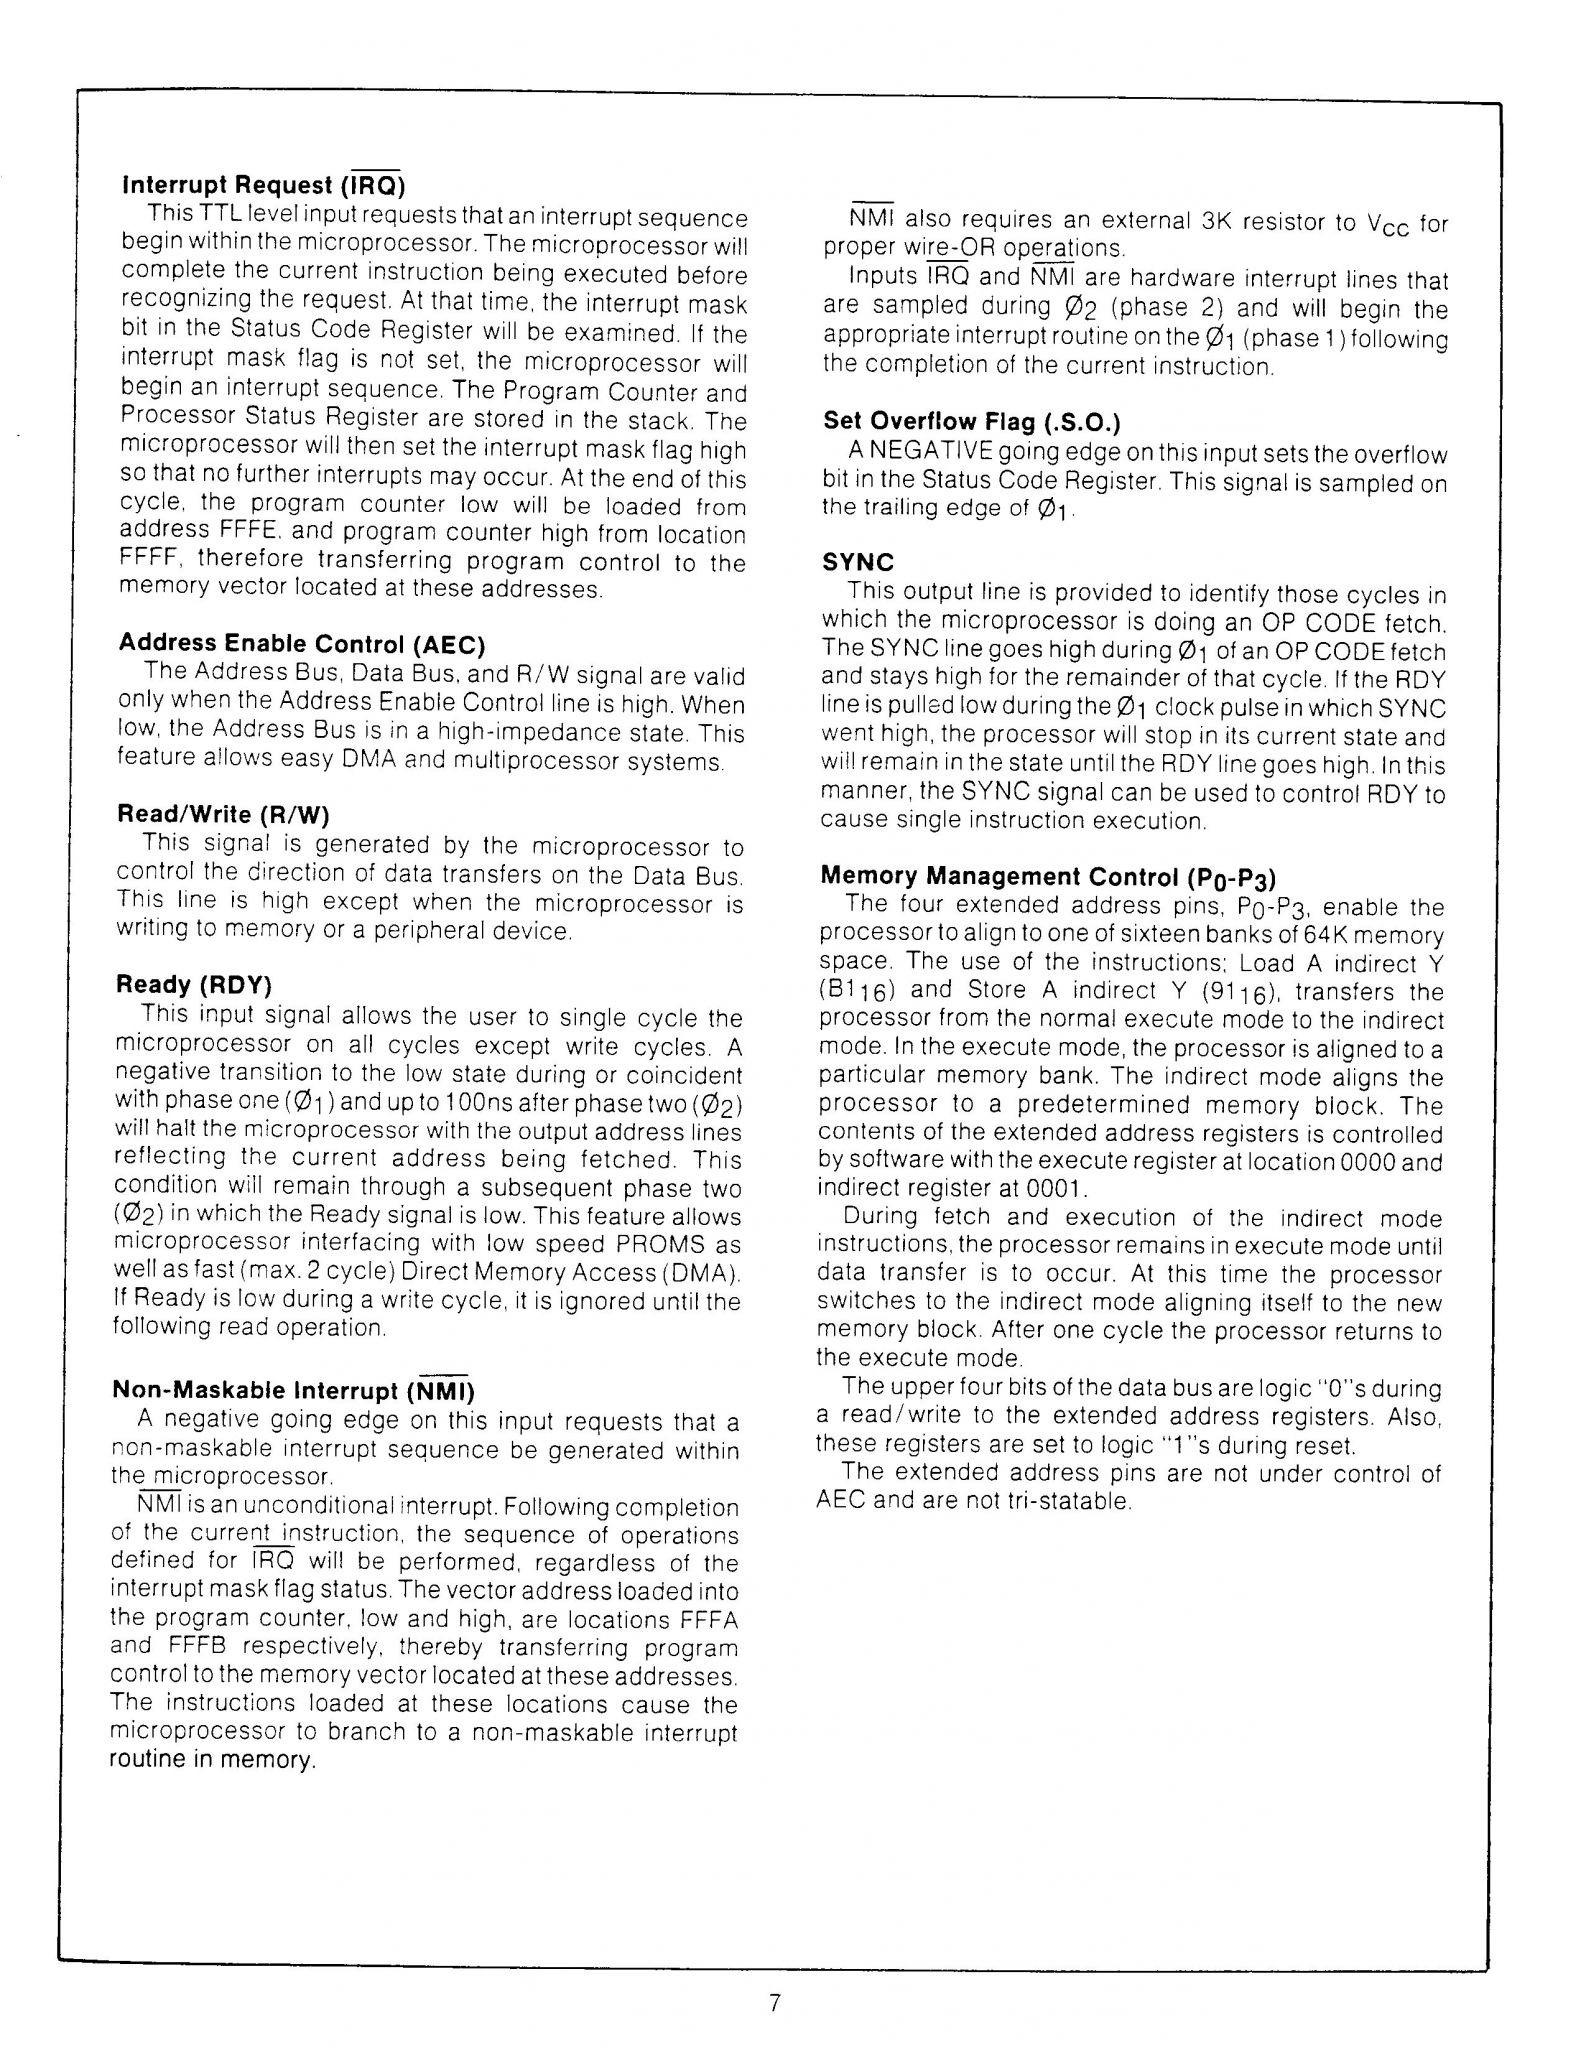 Nova Hunting the Elements Worksheet Nova Hunting the Elements Worksheet Answer Key